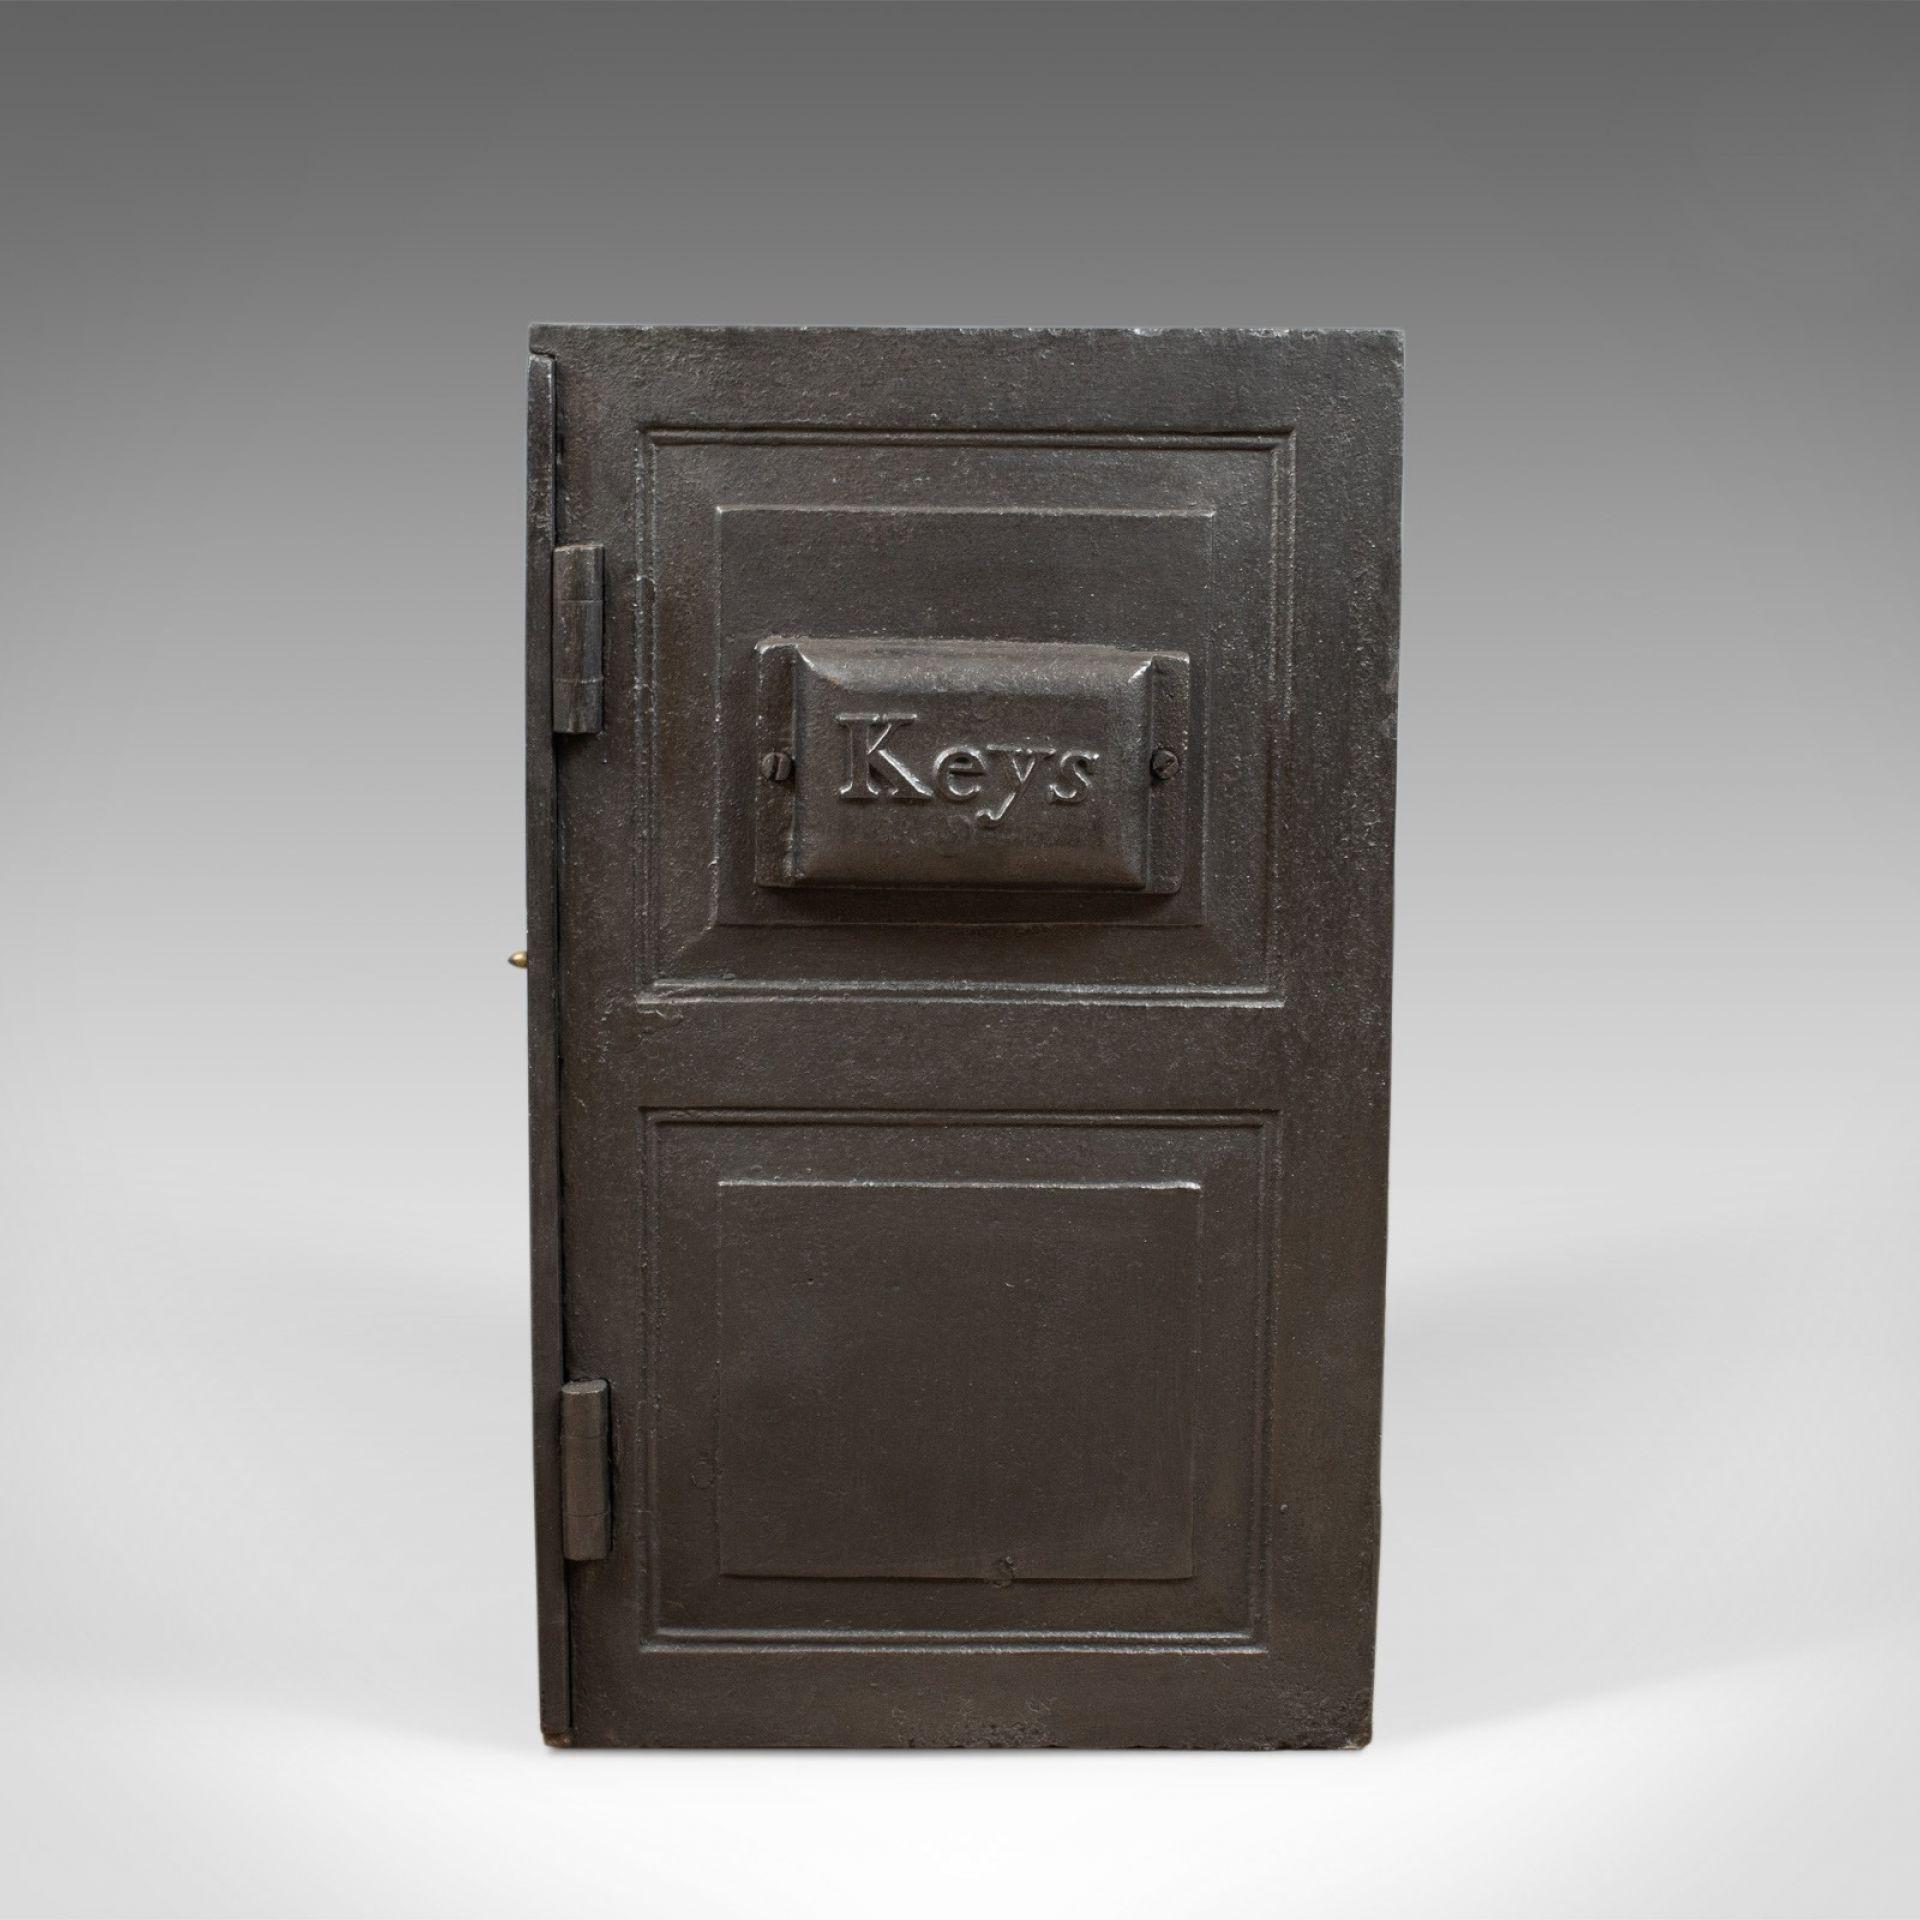 Antique Safe, English, Victorian, Cast Iron, Coalbrookdale, Circa 1880